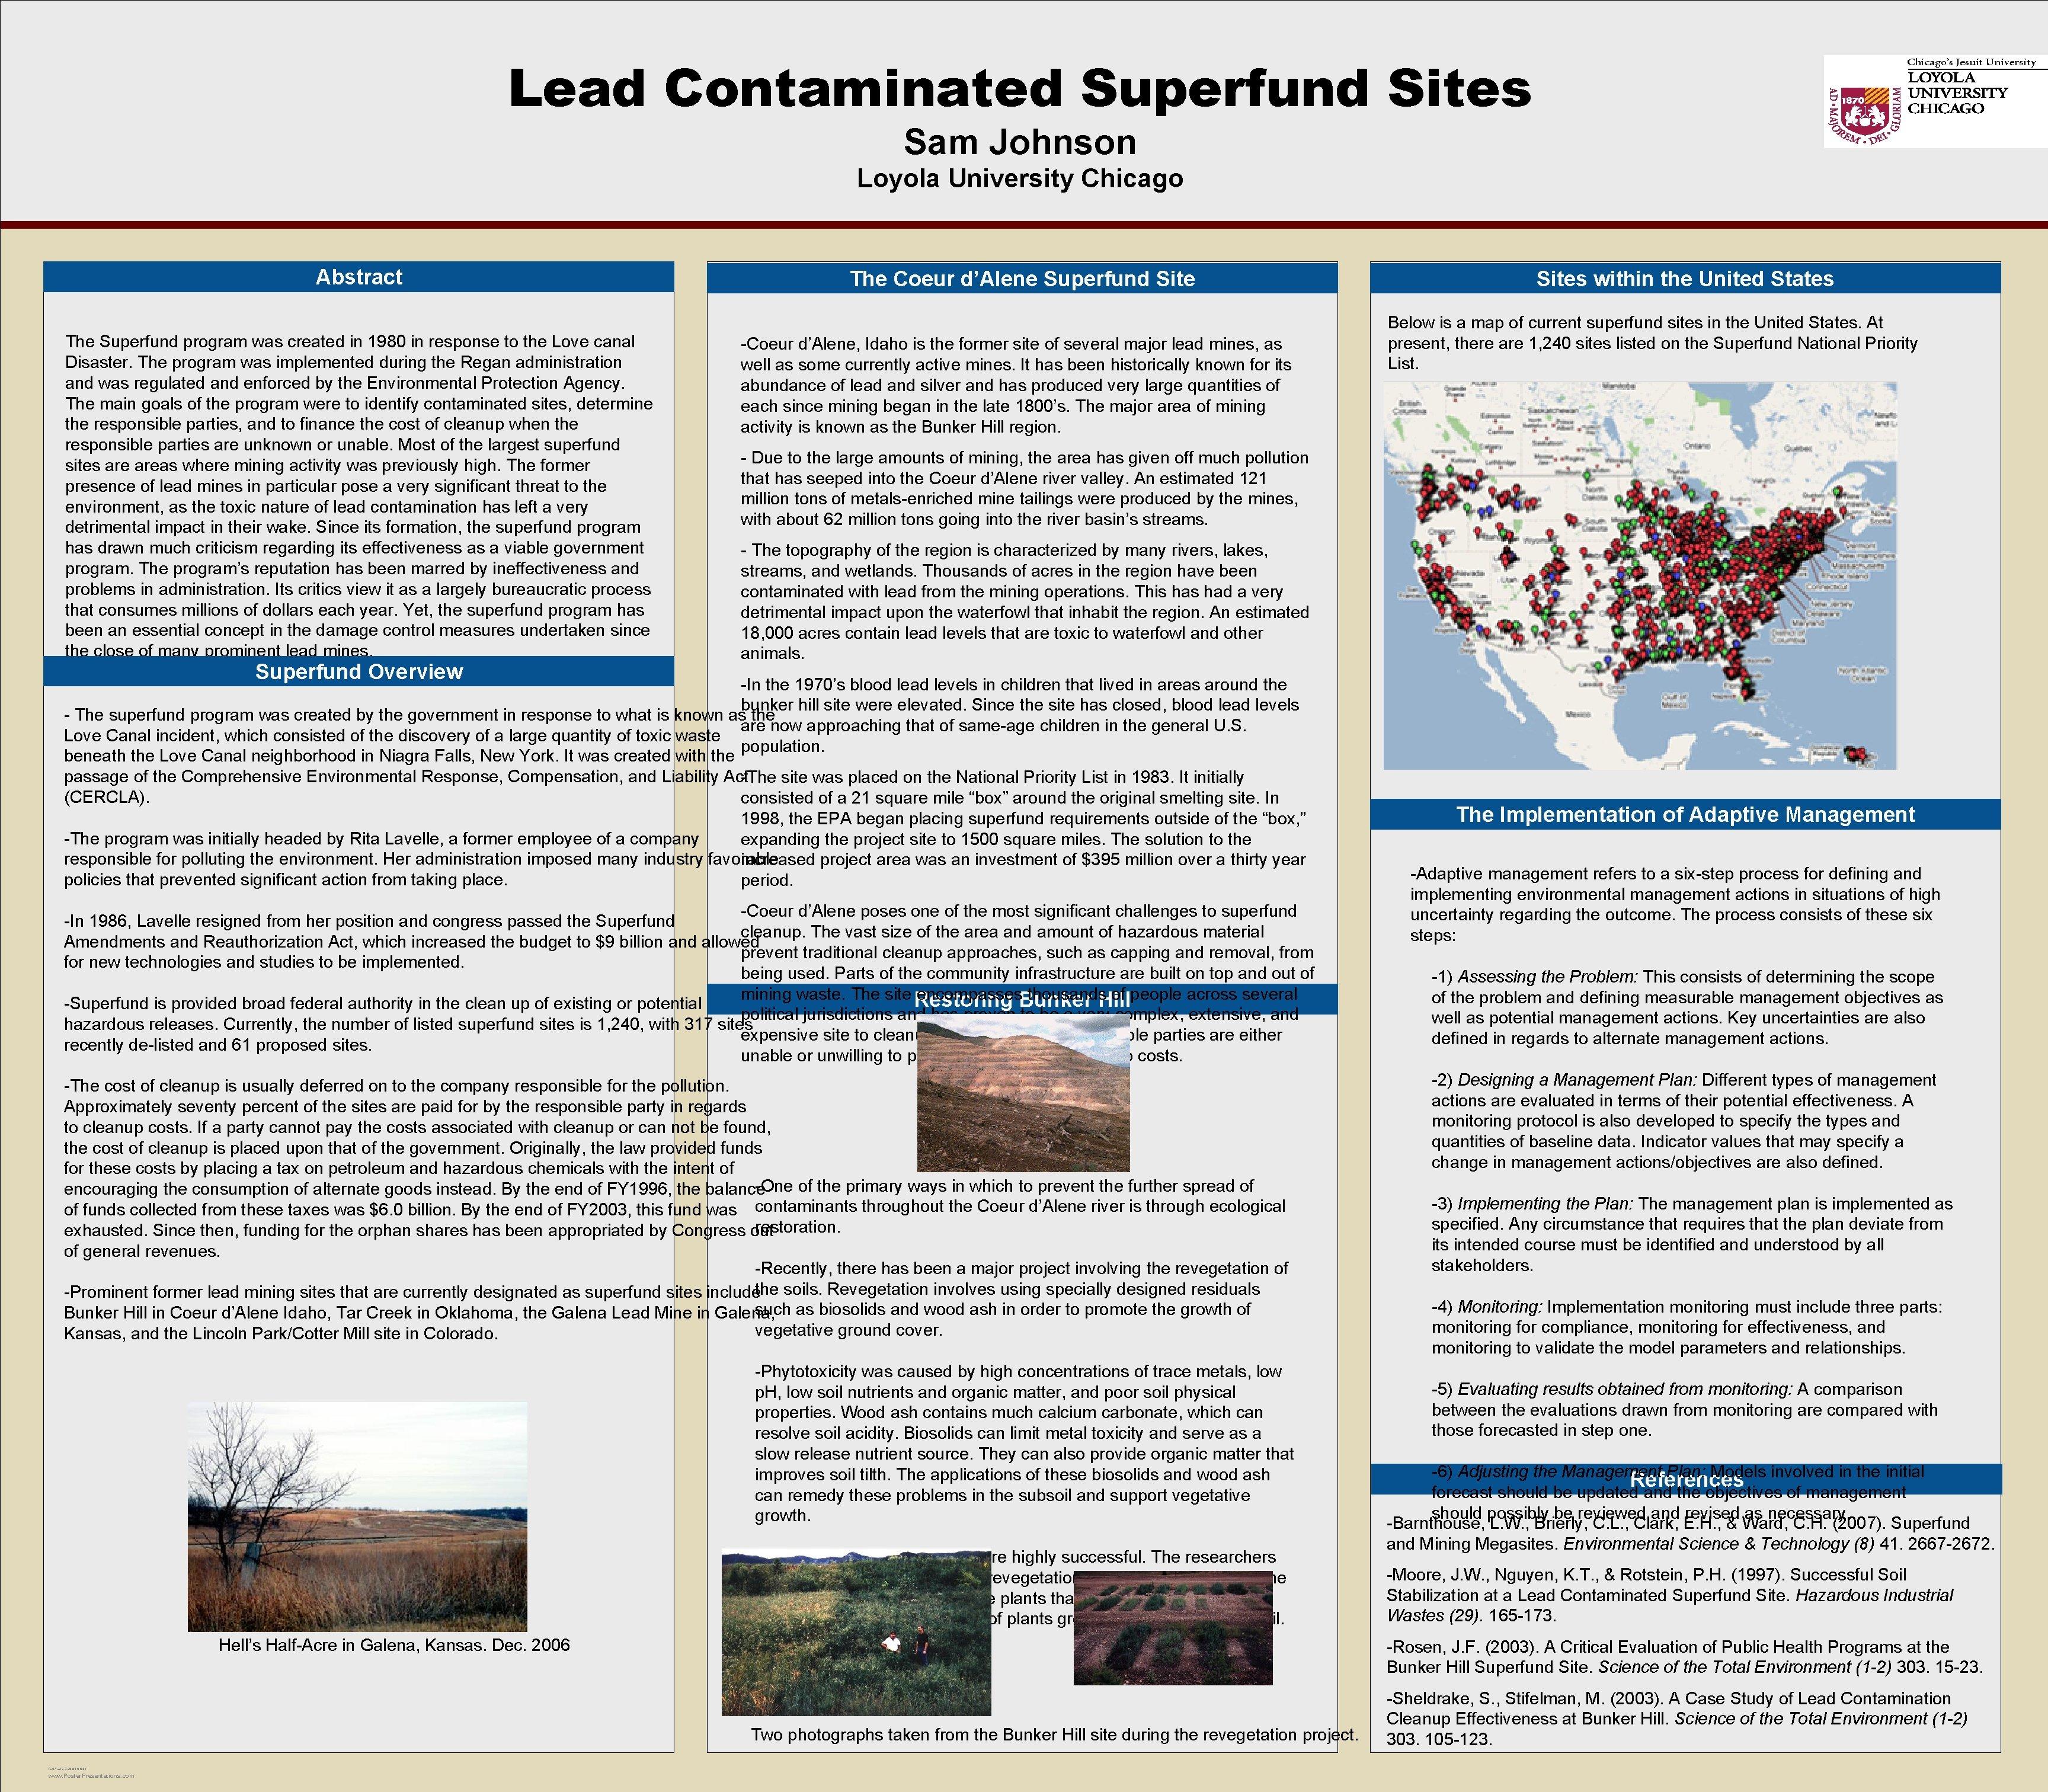 Lead Contaminated Superfund Sites OPTIONAL LOGO HERE Sam Johnson Loyola University Chicago Abstract The